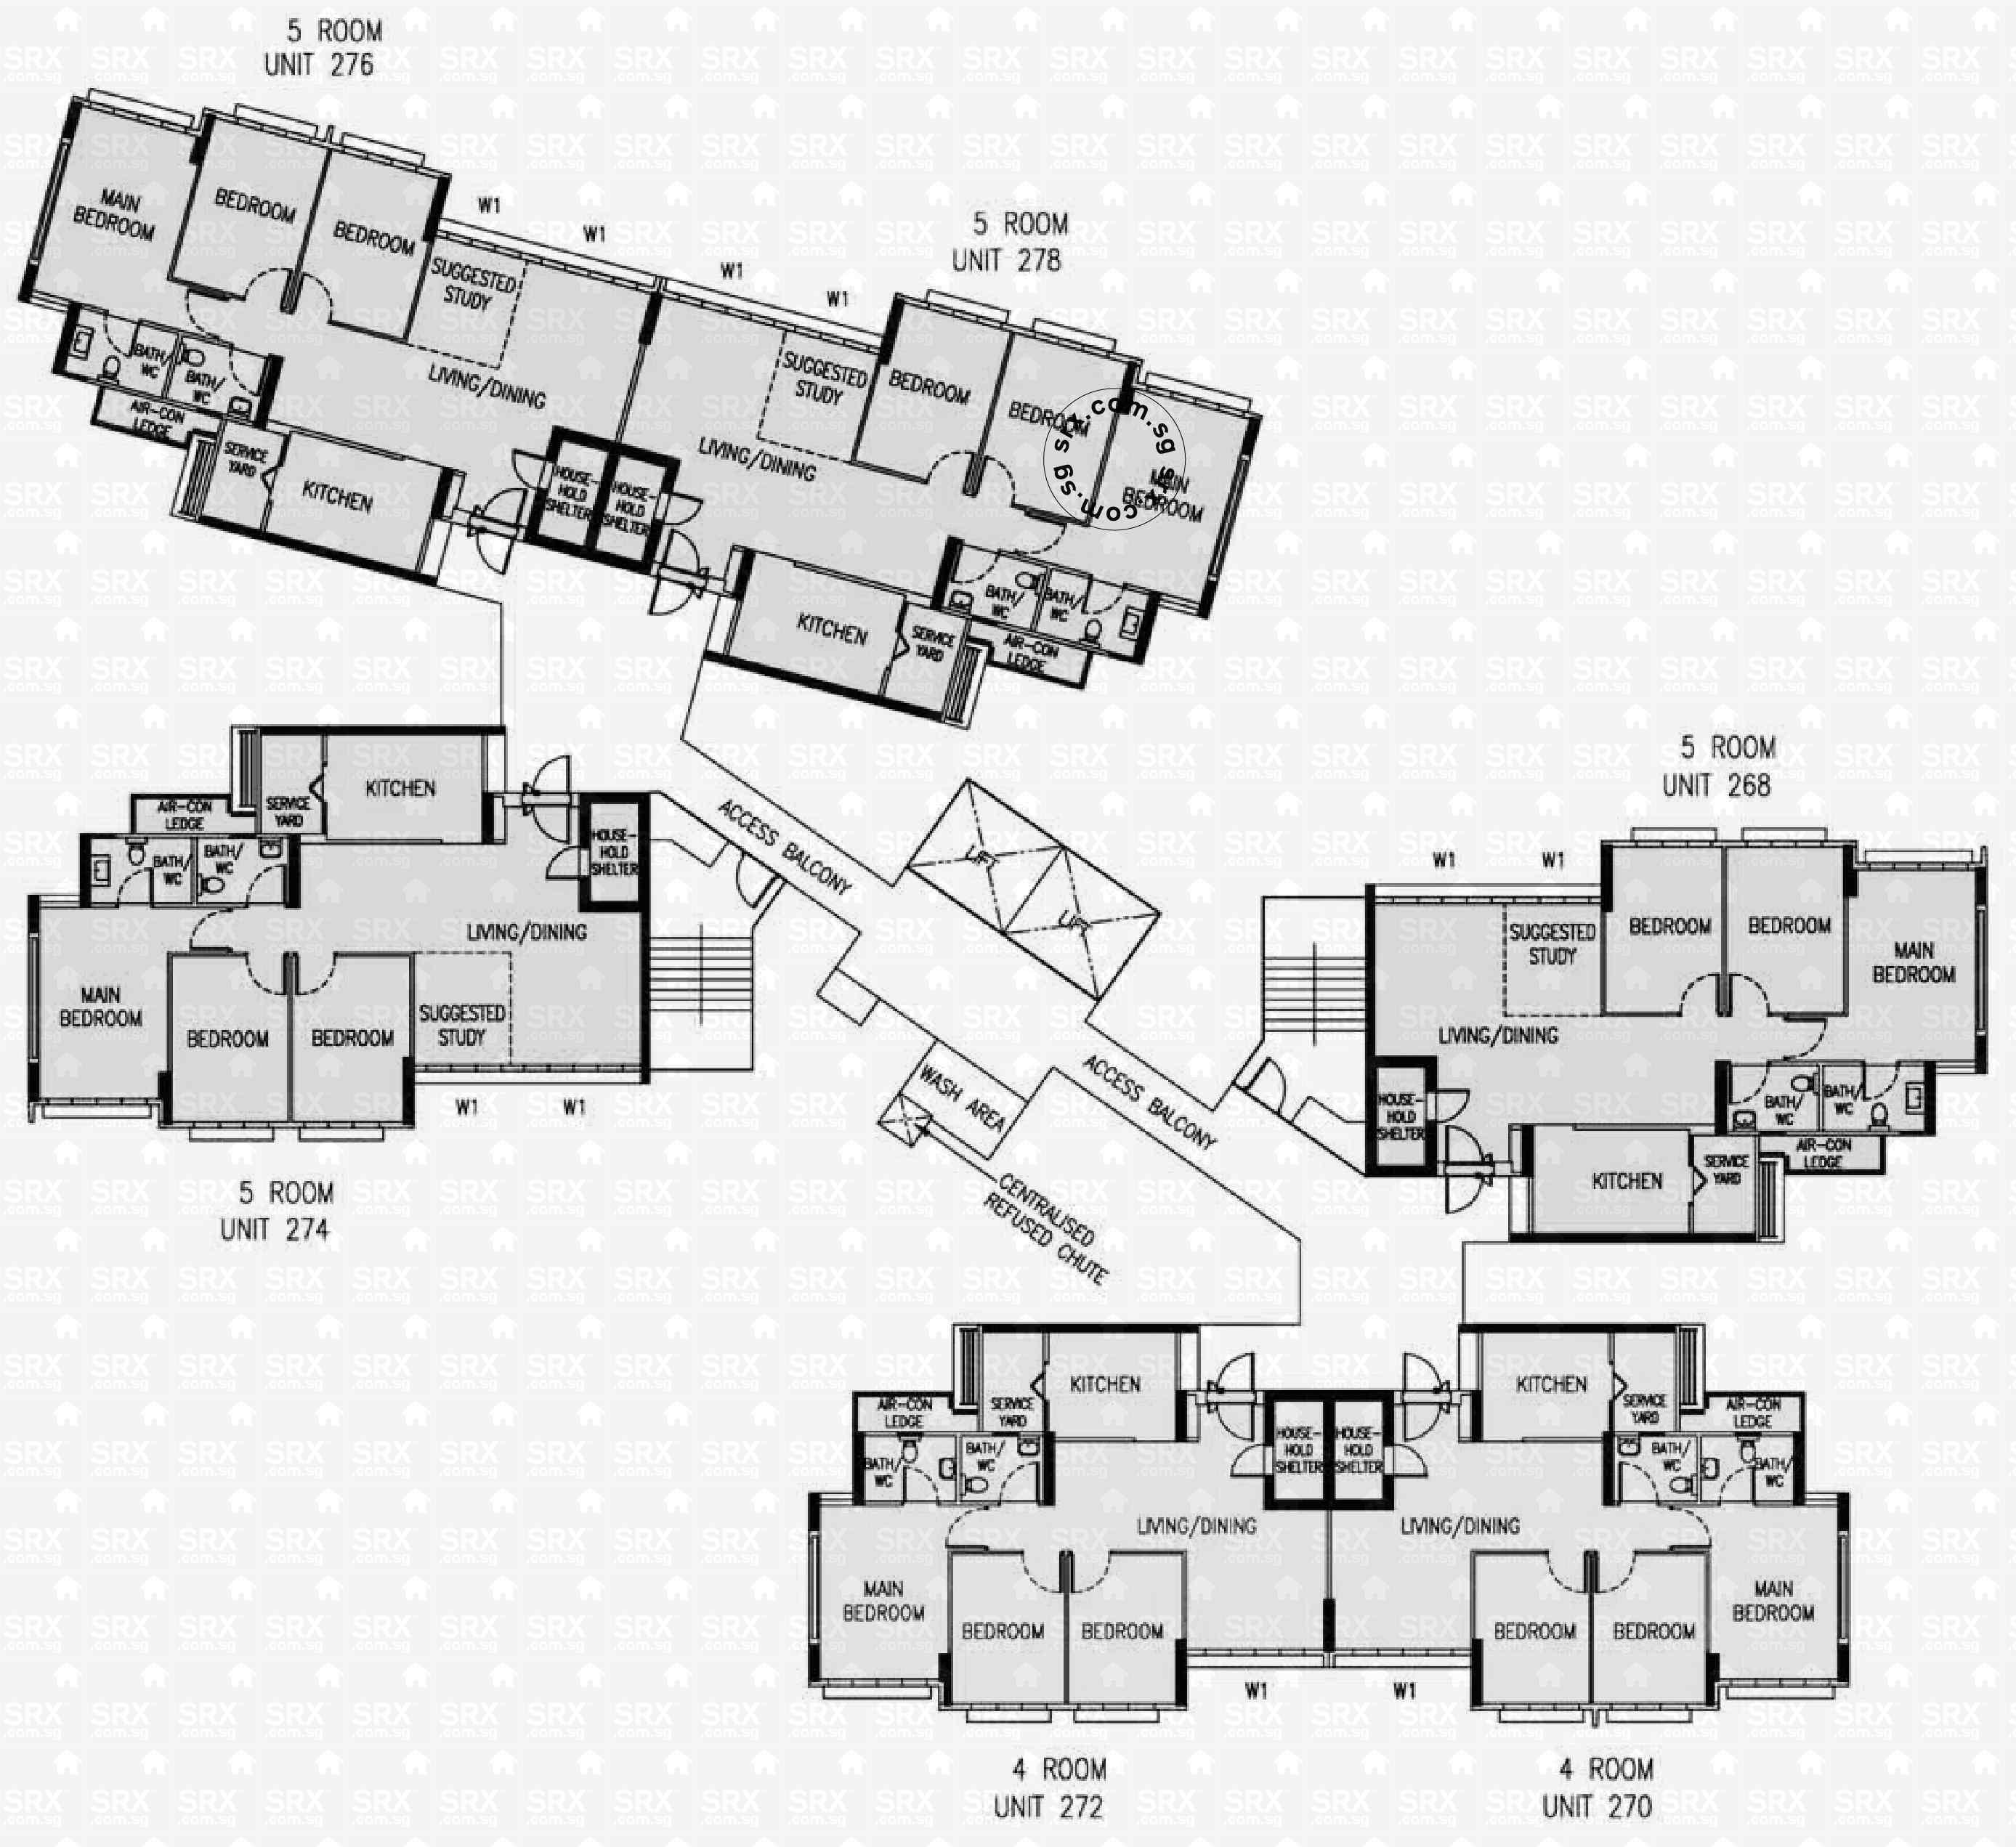 Floor plans for 164c rivervale crescent s 543164 hdb for 1077 marinaside crescent floor plan